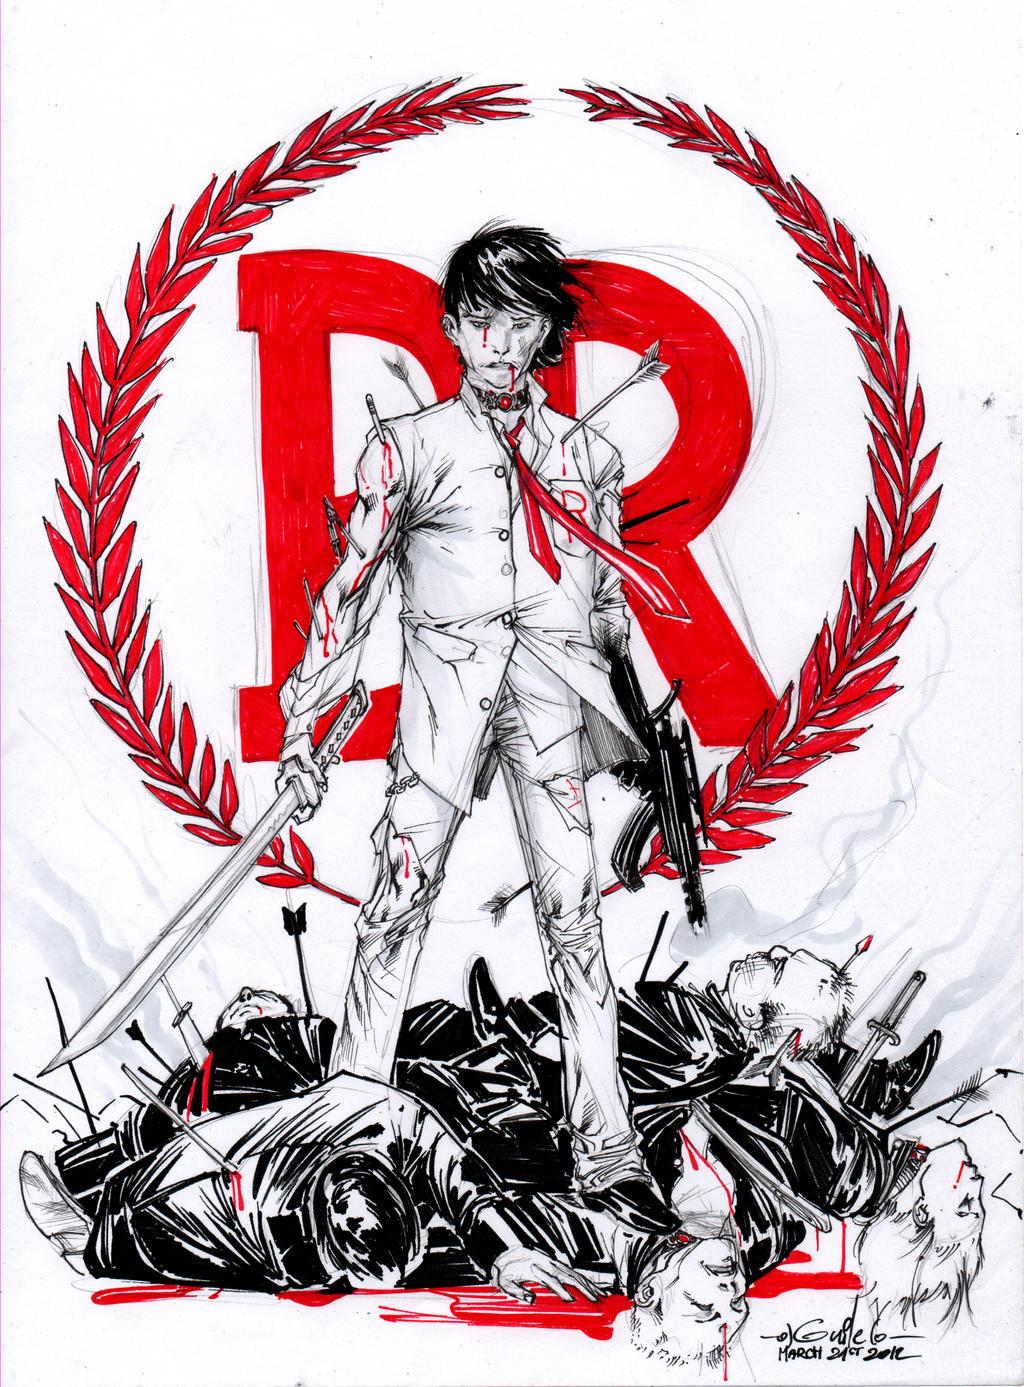 Battle Royale - Drink'n'Draw (March 21st 2012)